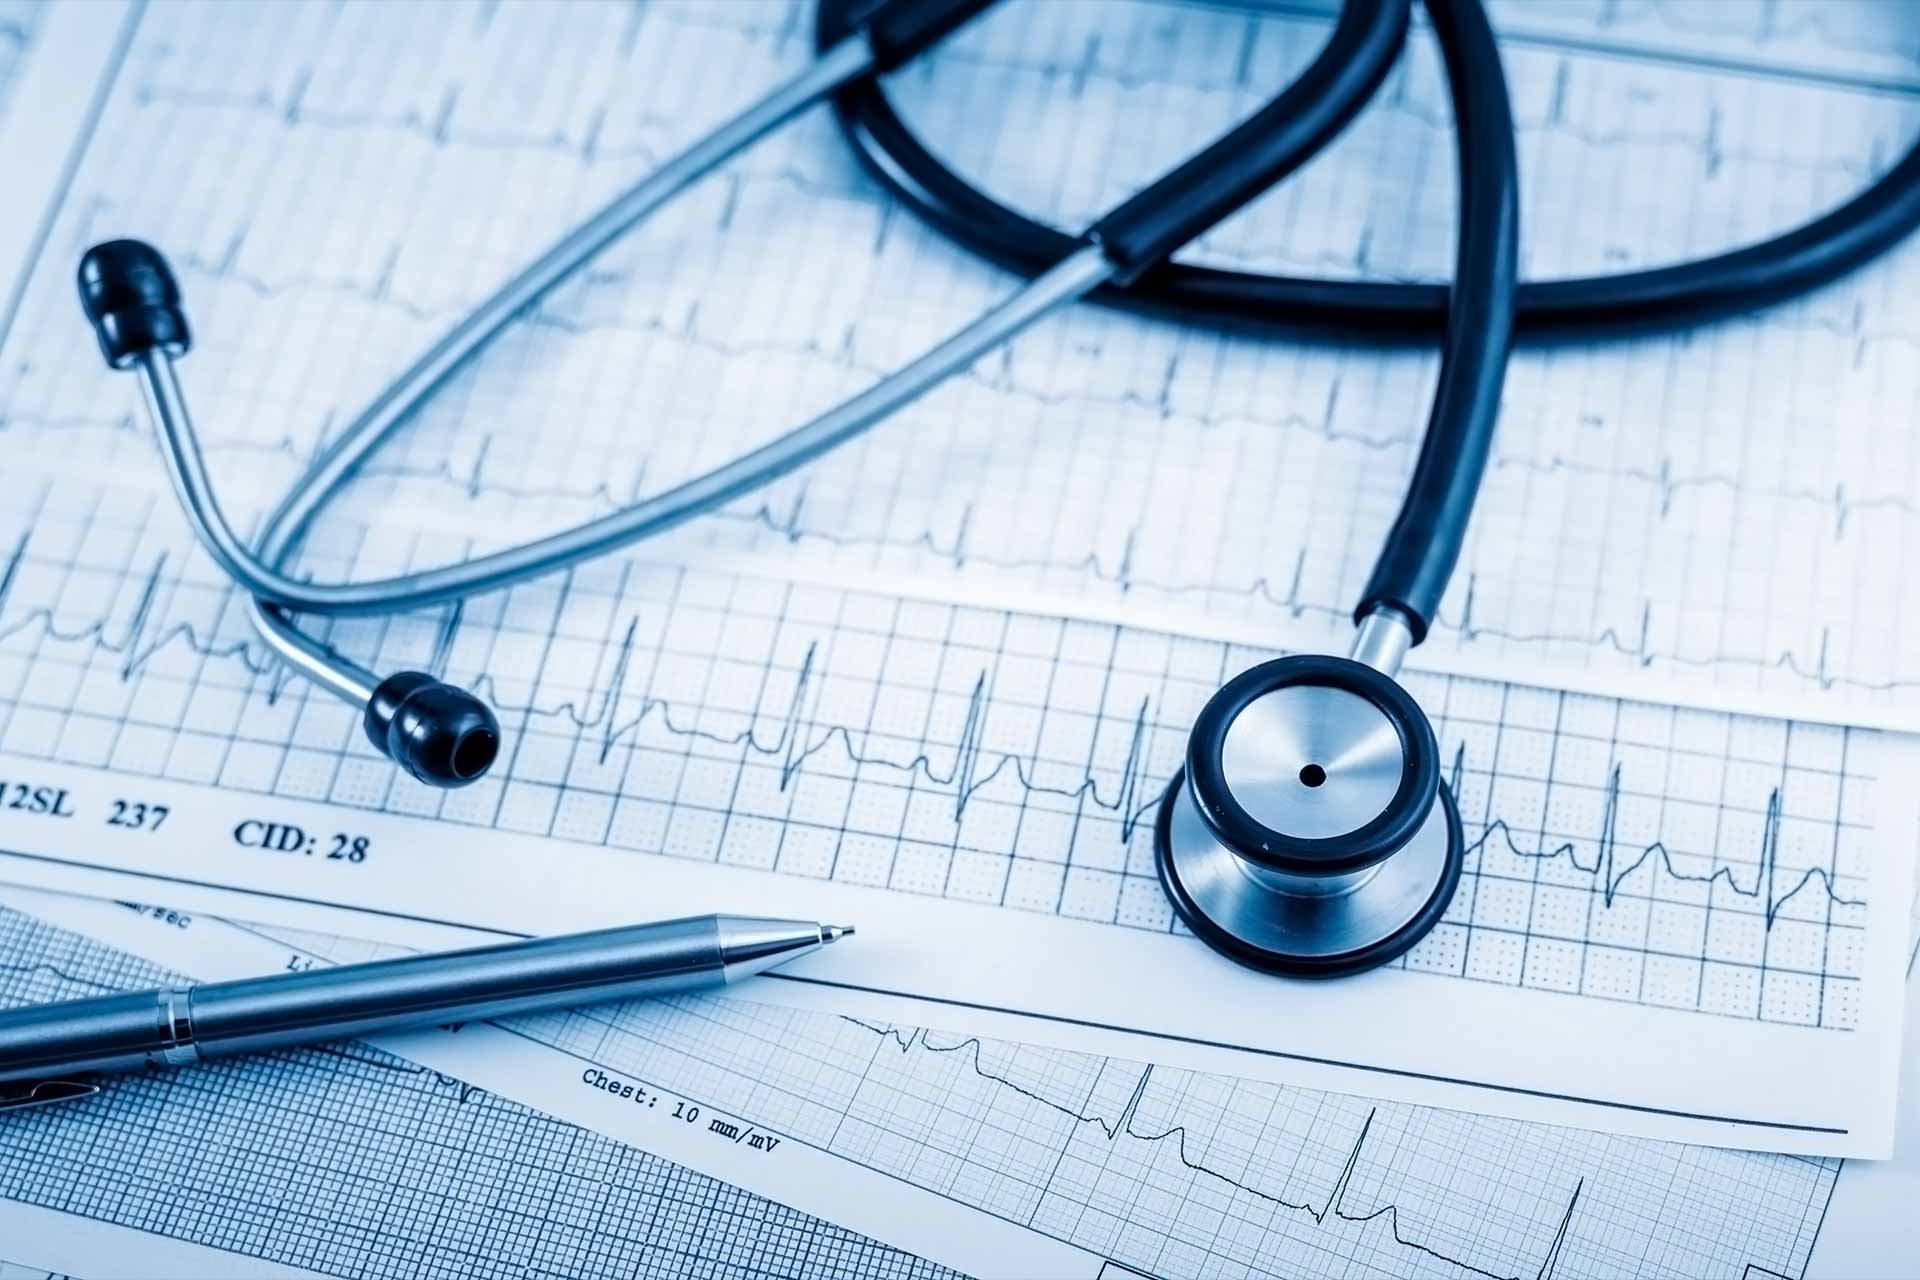 Privatarztpraxis Integrative Medizin – Ruhe EKG, Langzeit (24 Stunden) EKG, Langzeit (24 Stunden) Blutdruck Messung in Braunschweig.